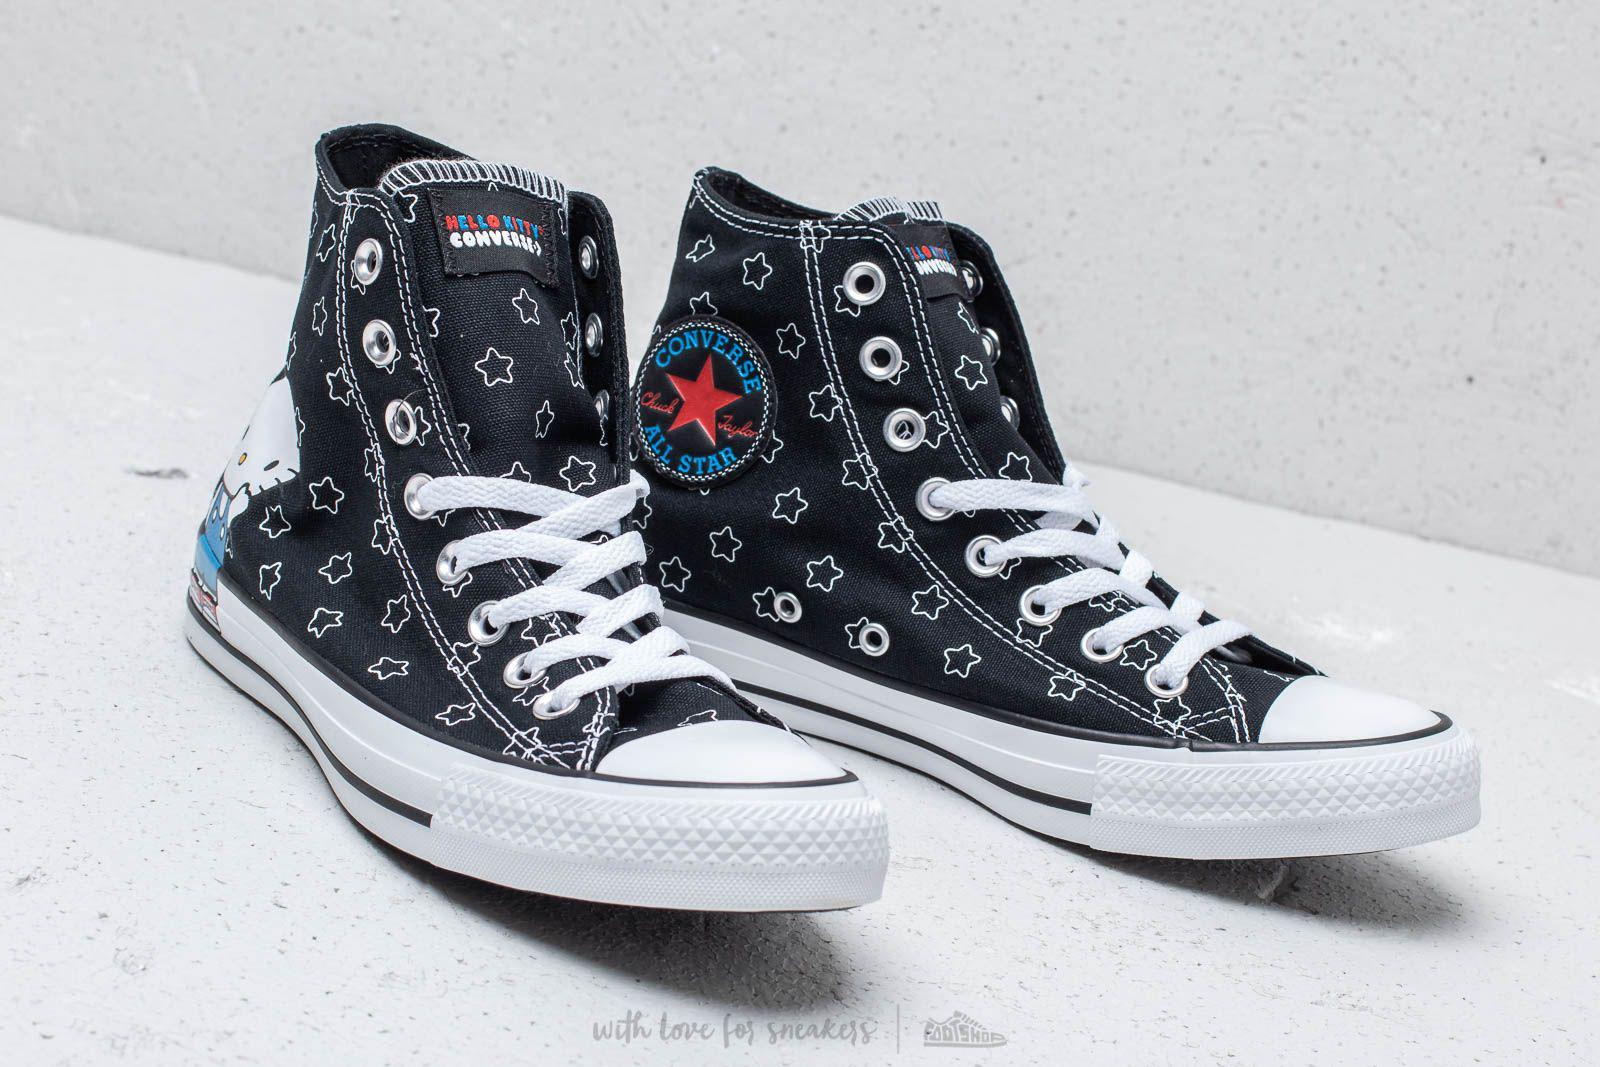 beb5ff9674bb5a Lyst - Converse X Hello Kitty Chuck Taylor All Star Hi Black  White ...